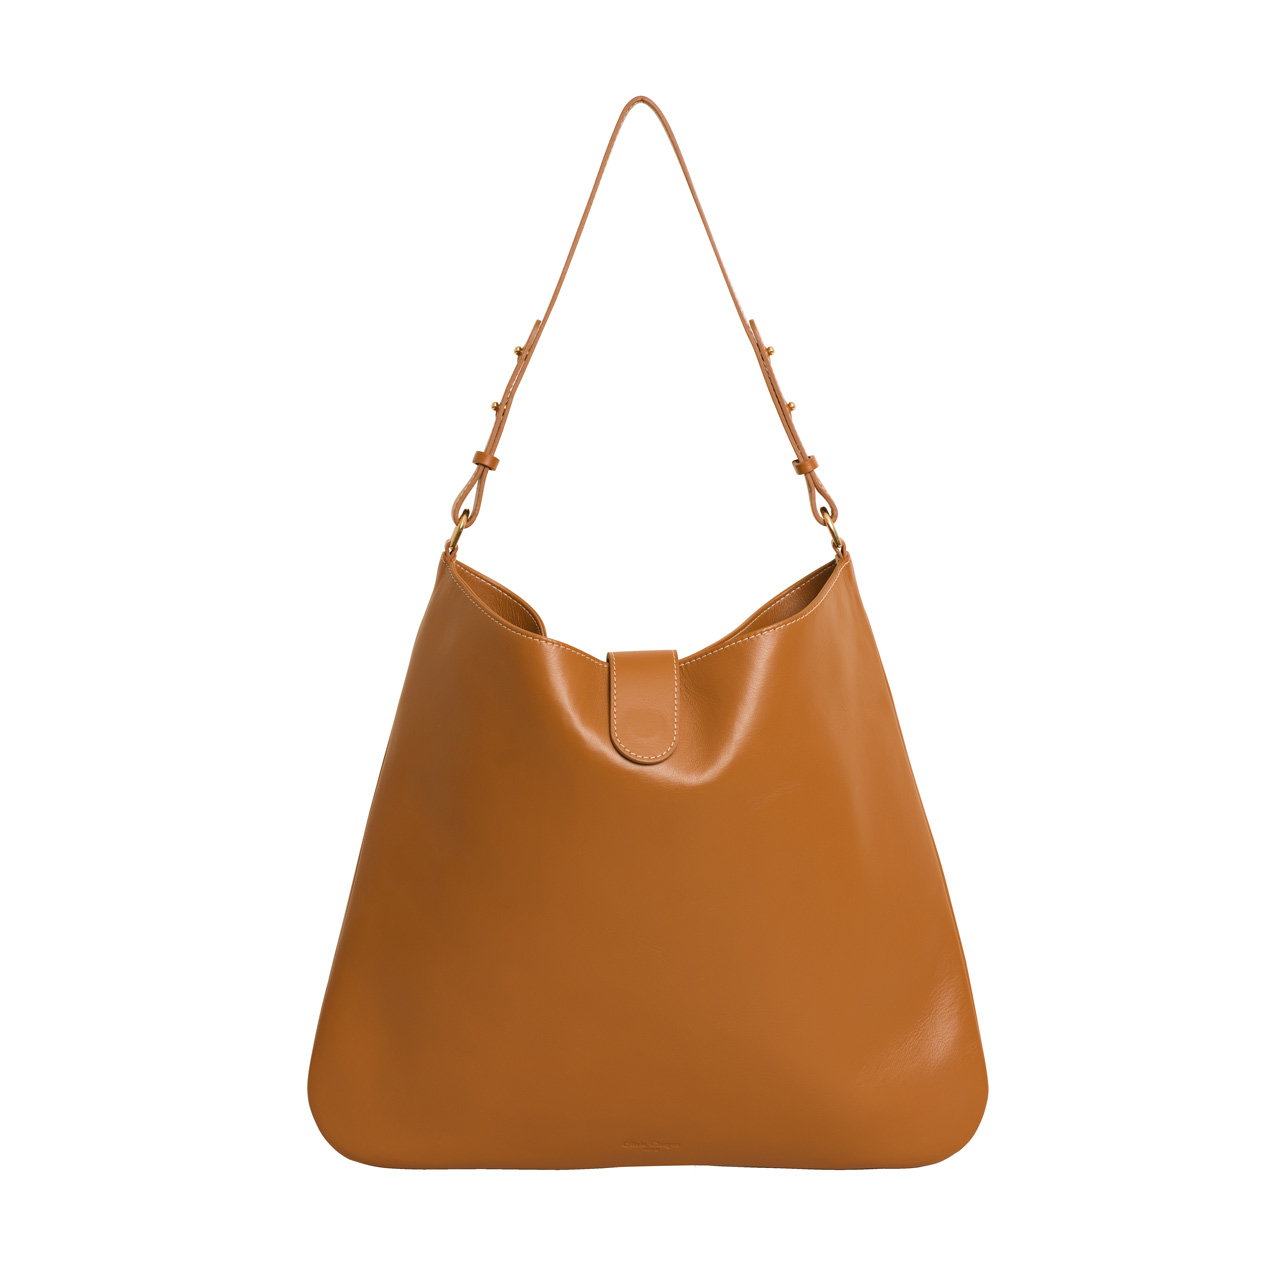 Olivia Clergue sac Iris cognac cuir